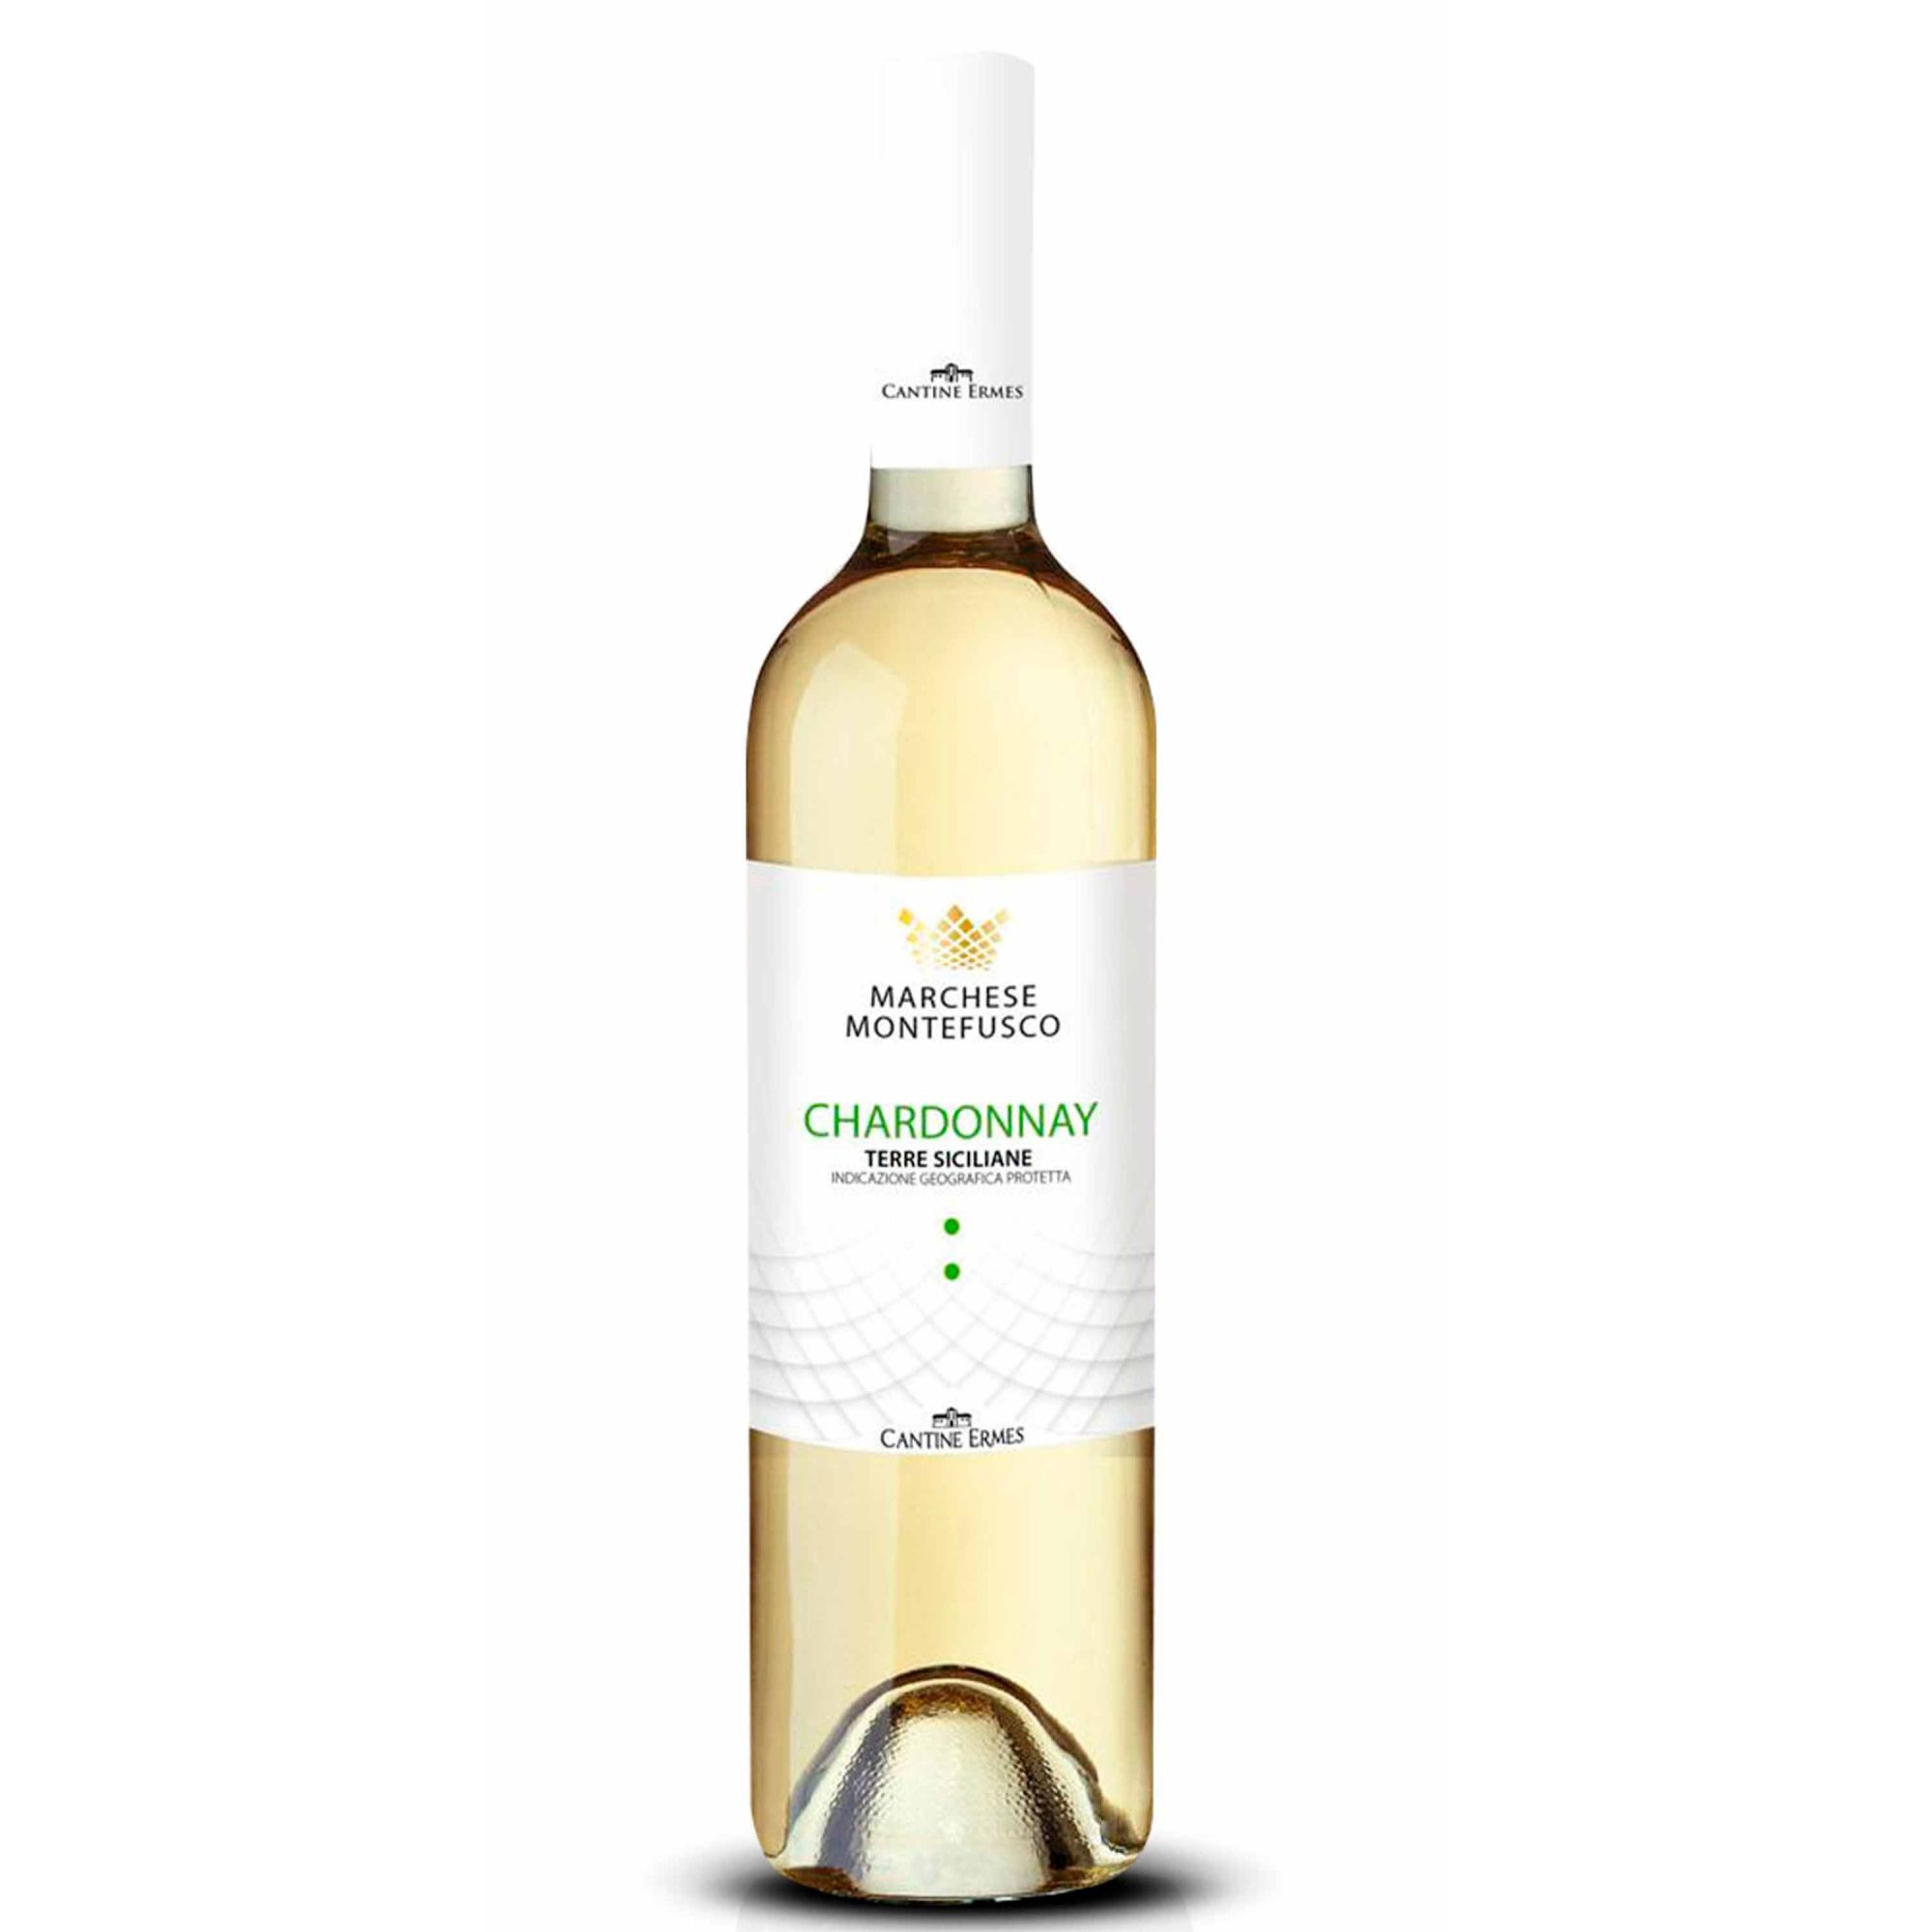 Vinho Marchese Montefusco Chardonnay IGT